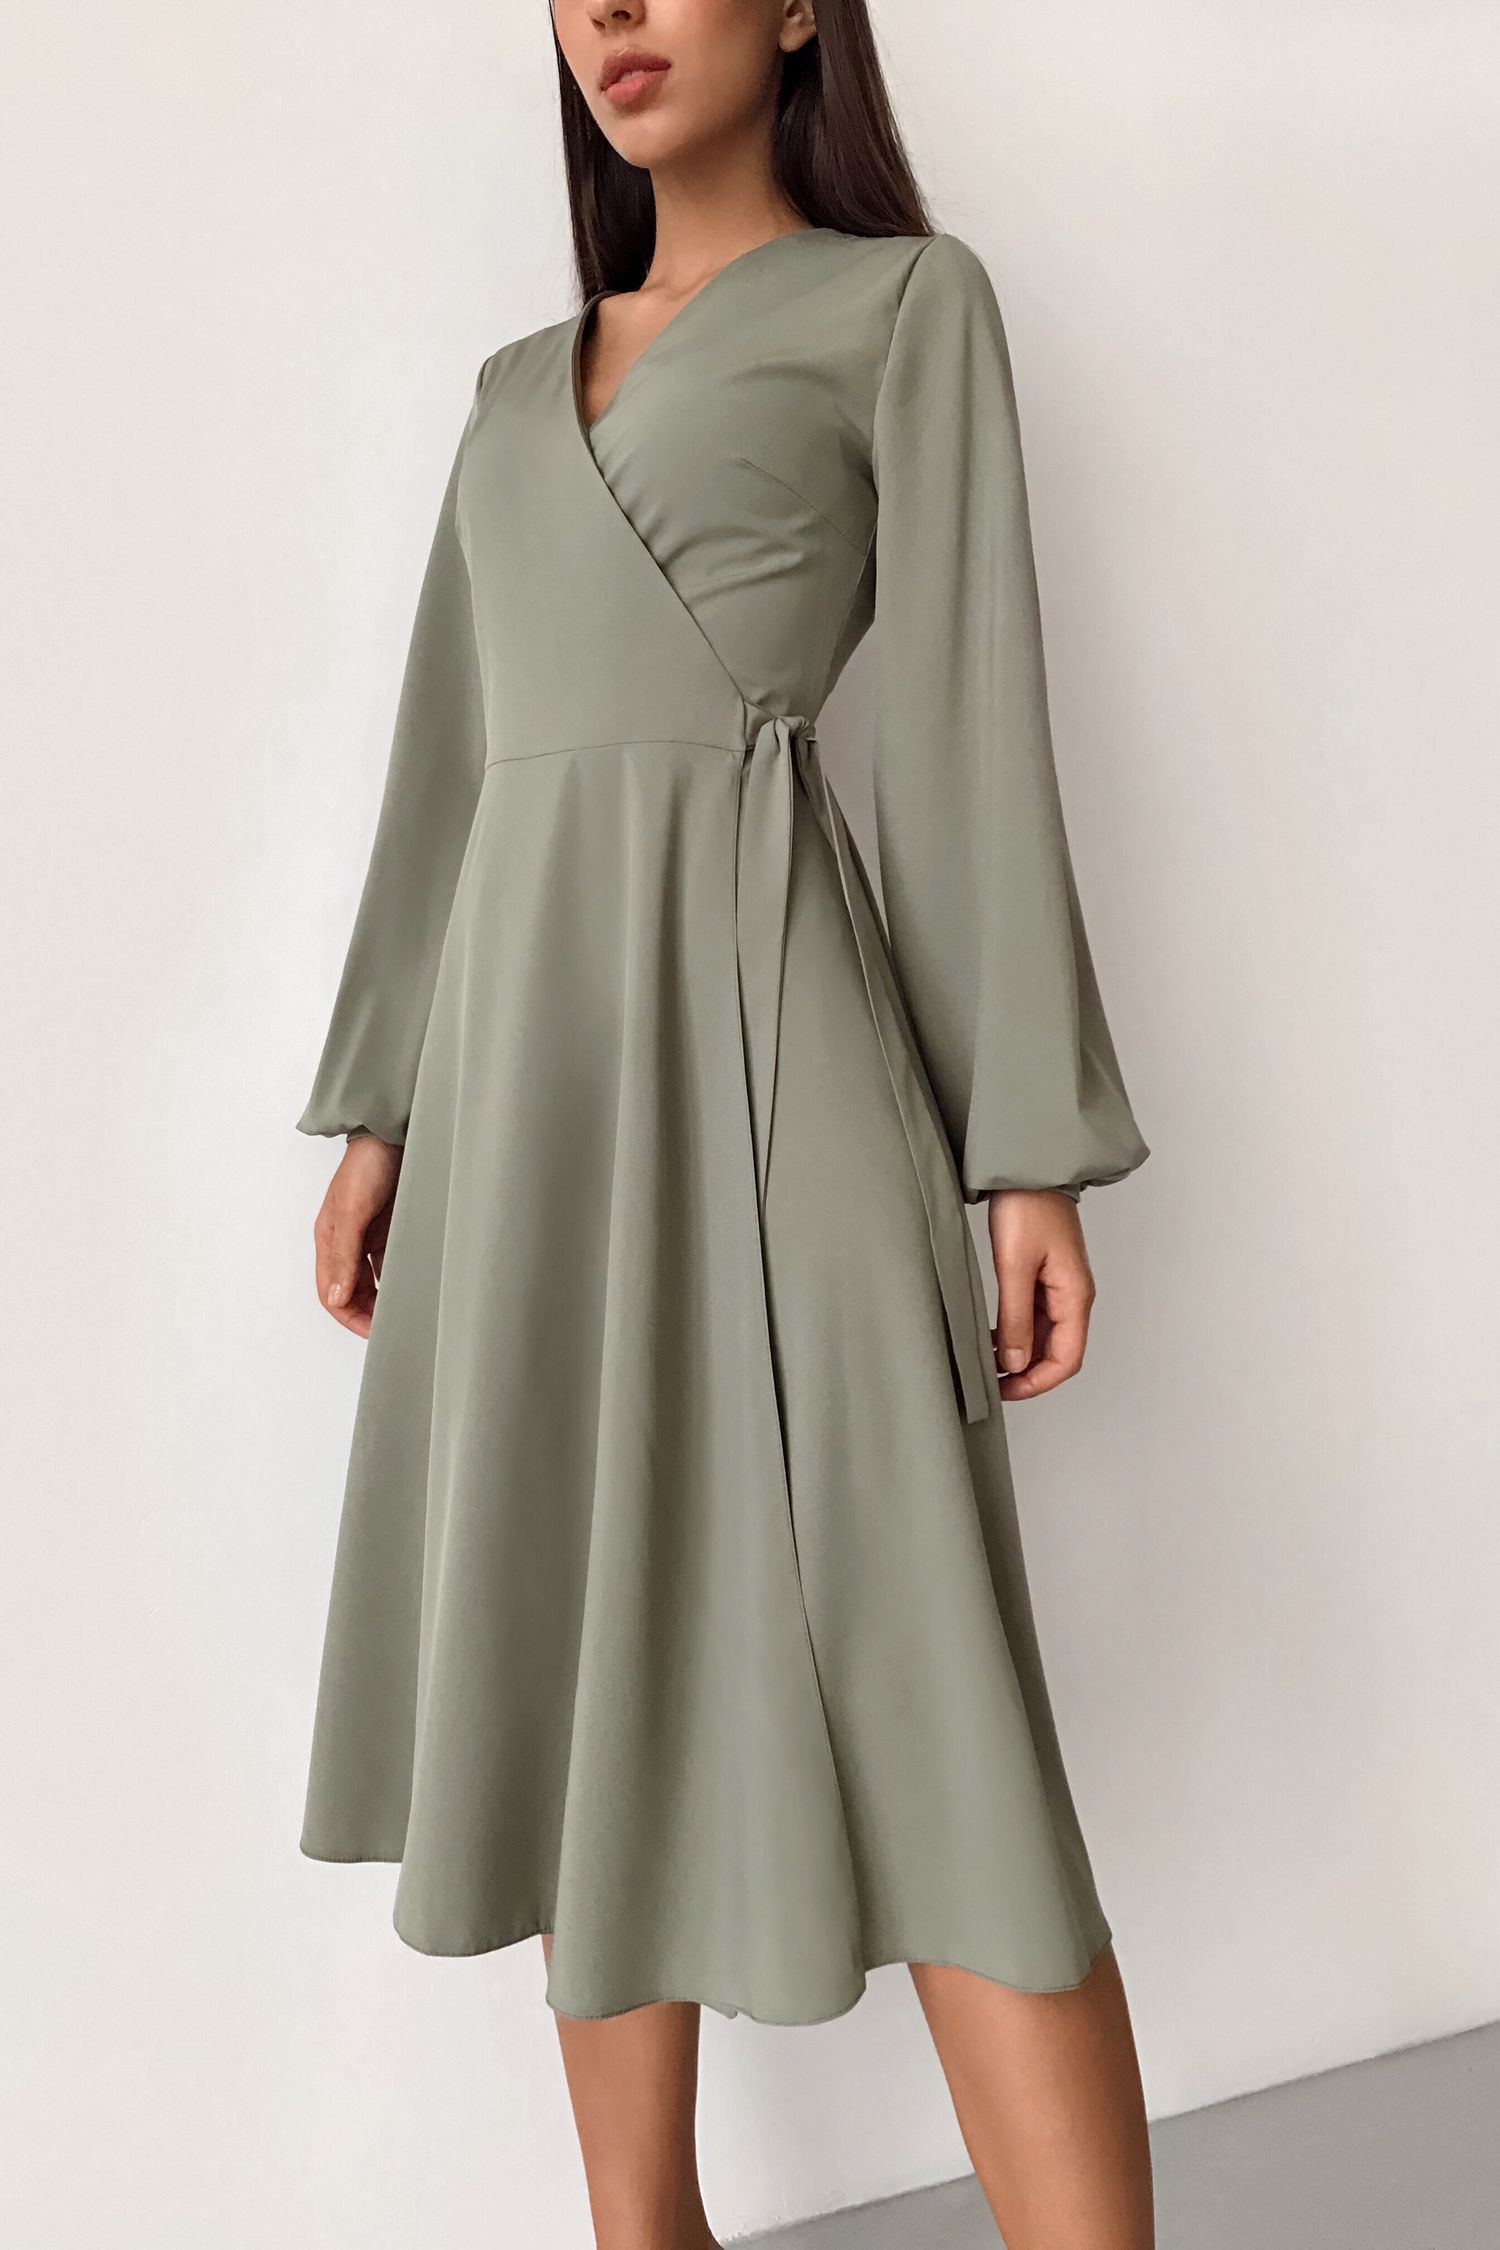 Платье миди на запах хаки - THE LACE